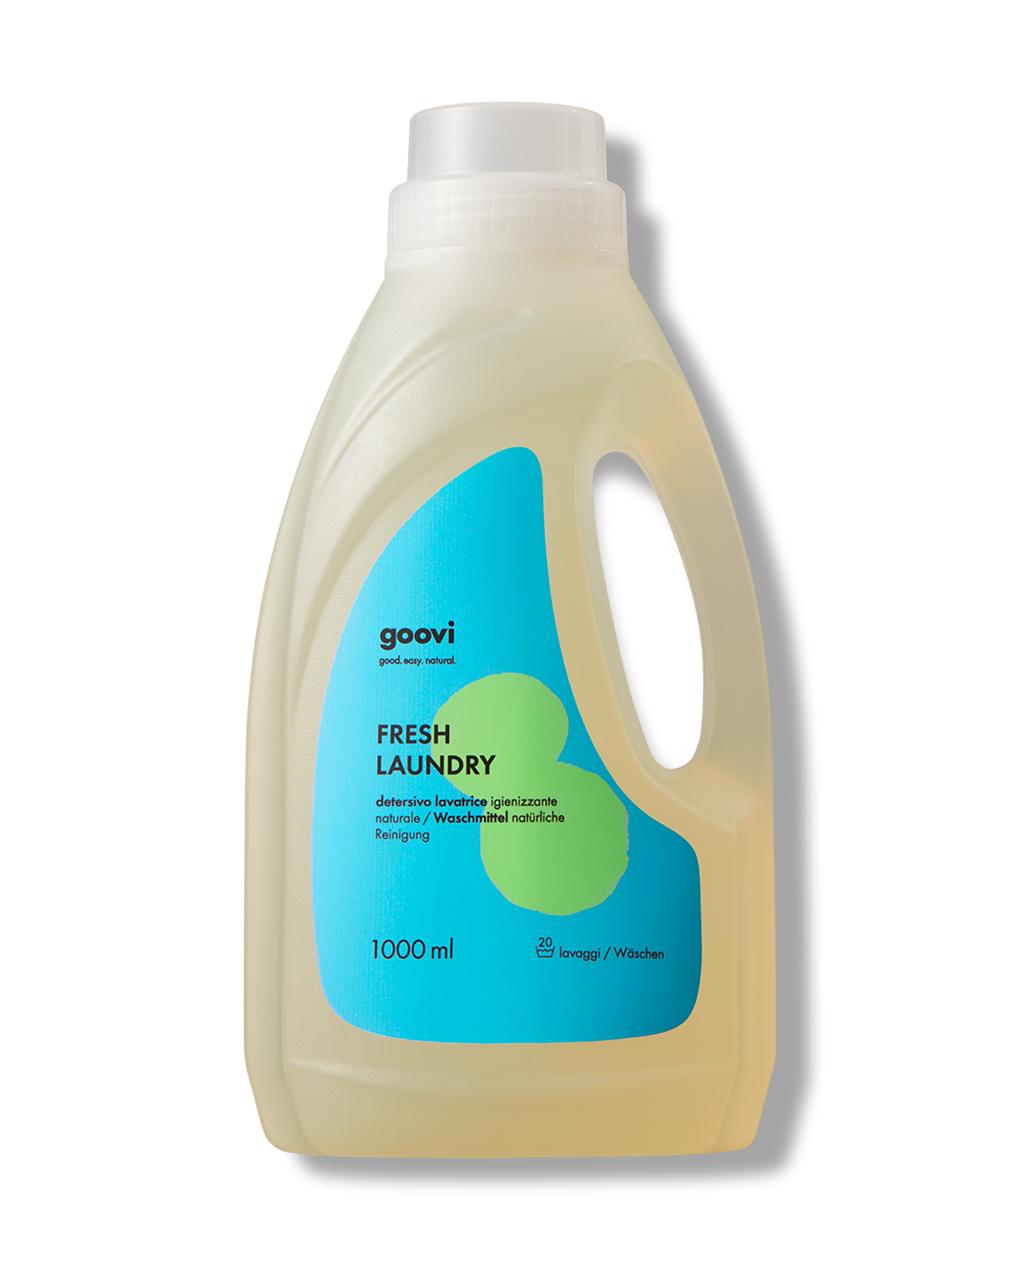 Detersivo lavatrice -  1000 ml - Goovi